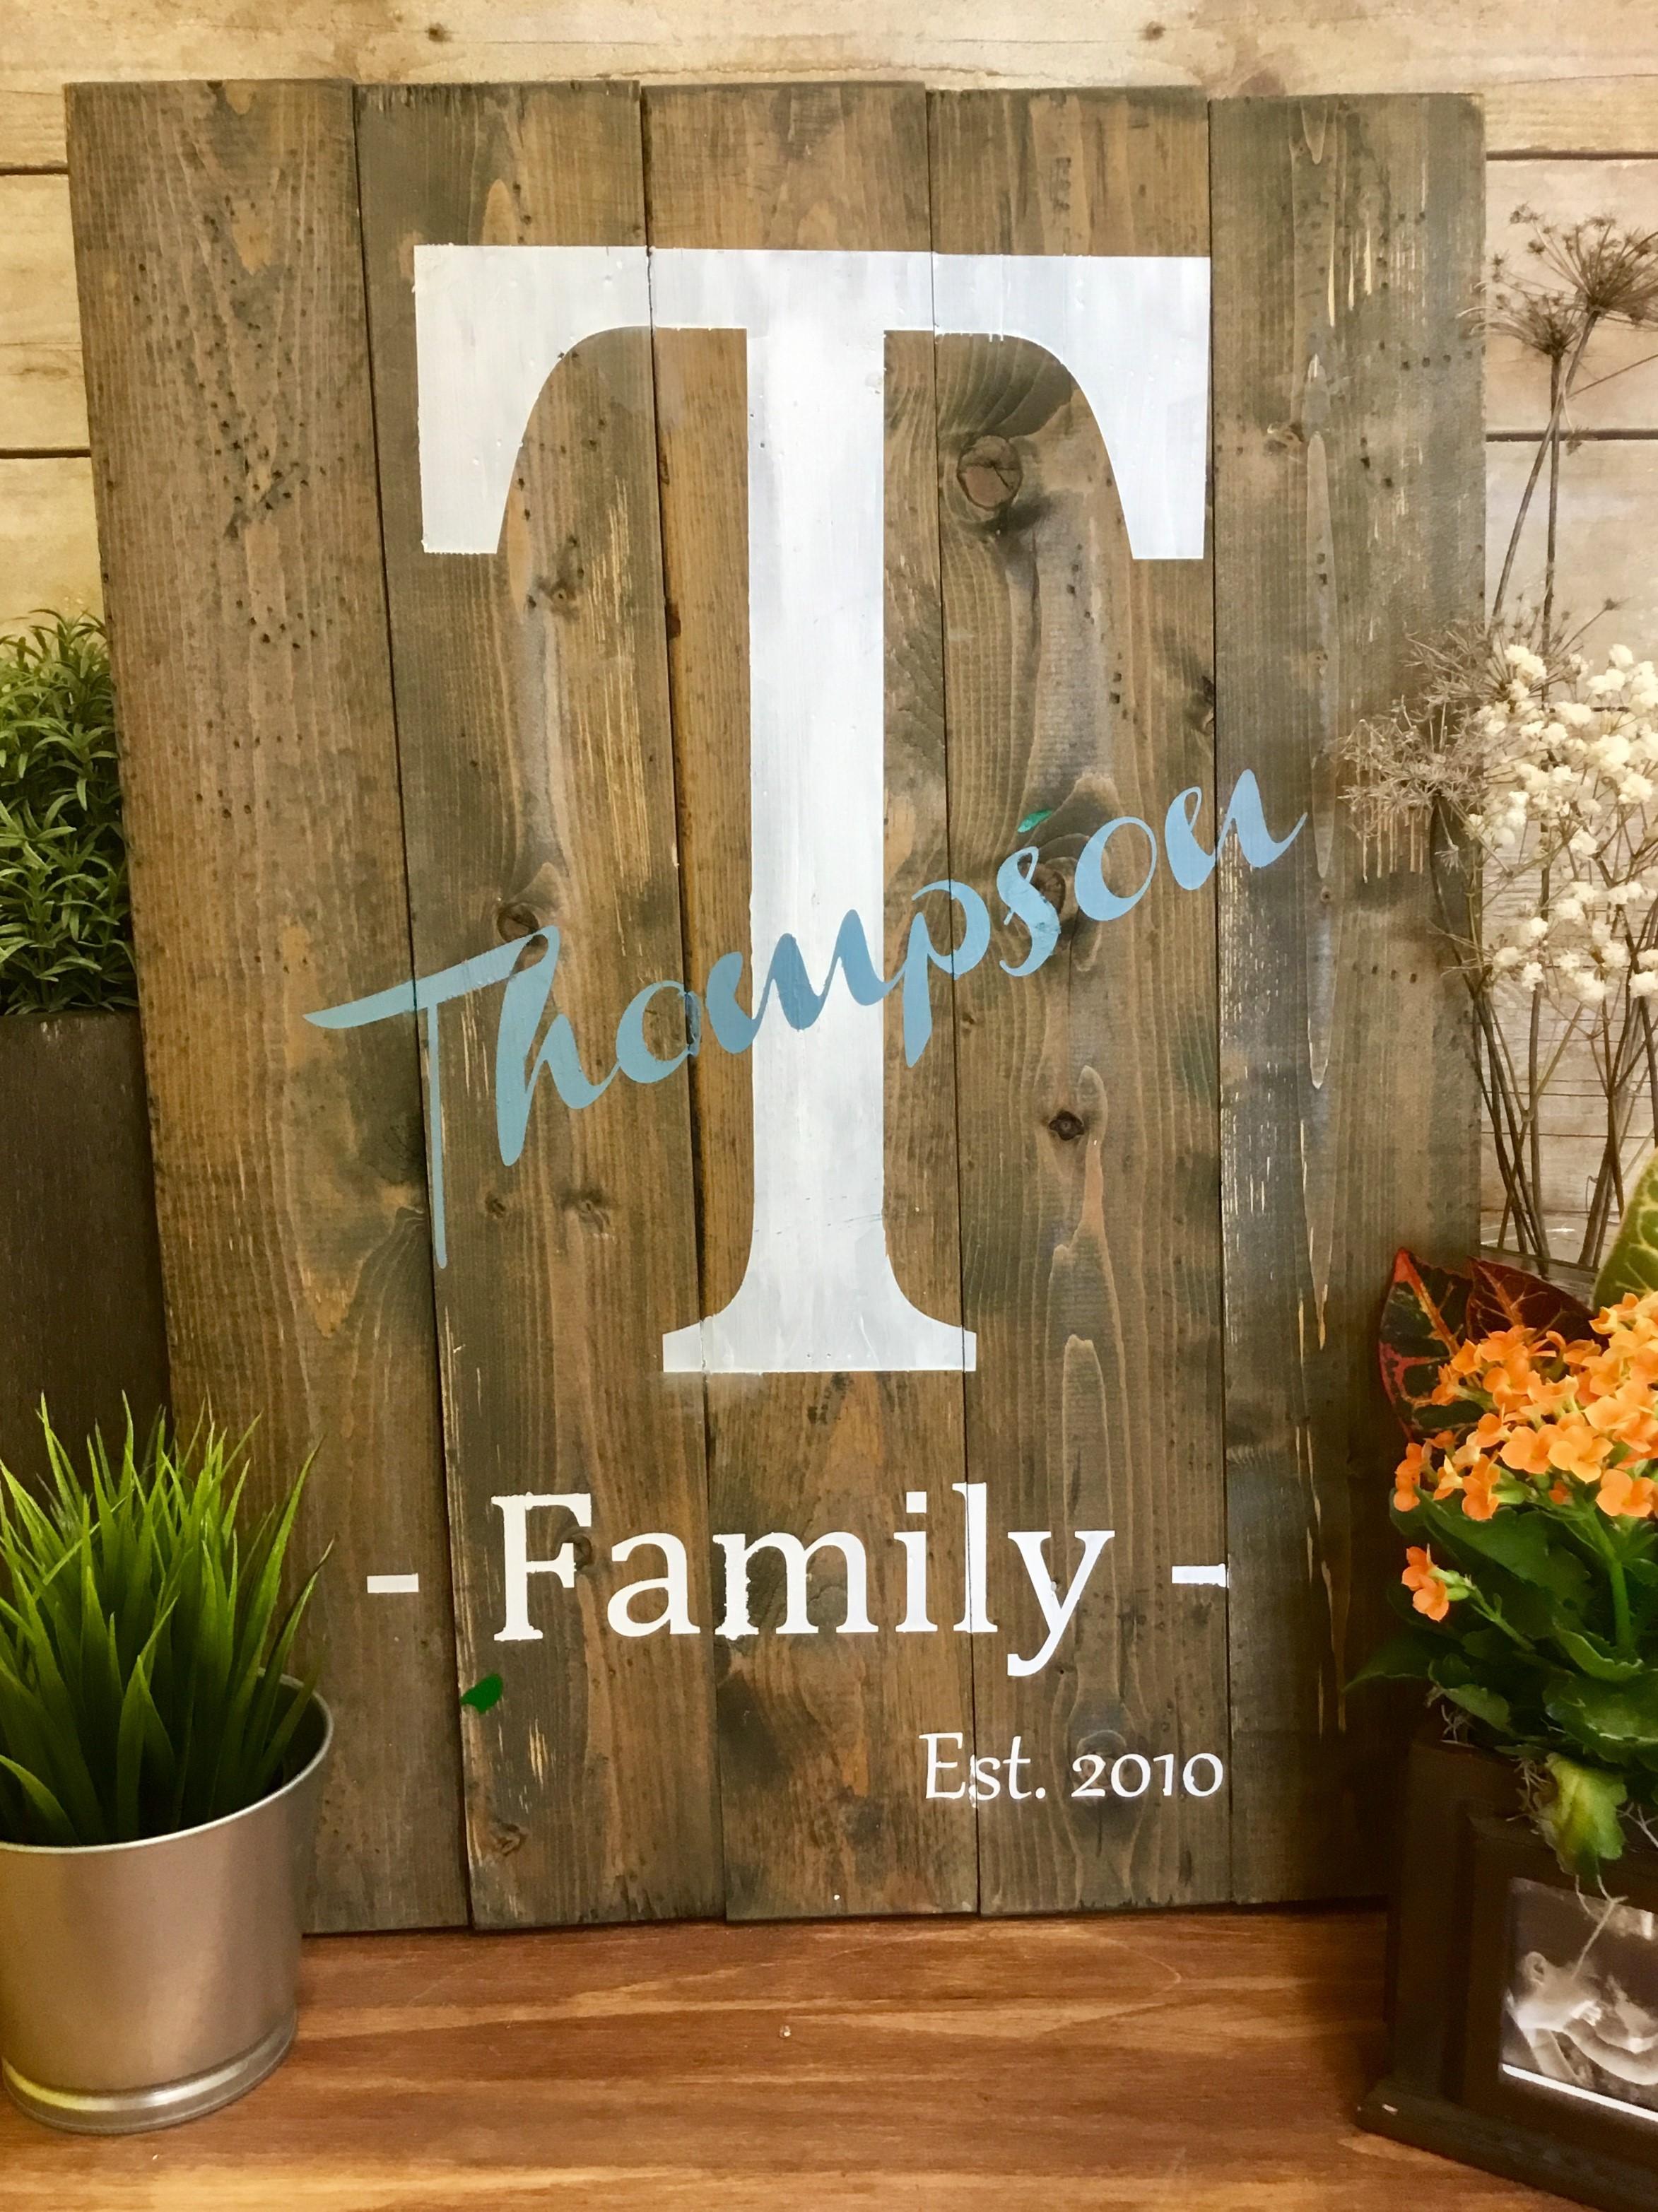 T- thompson